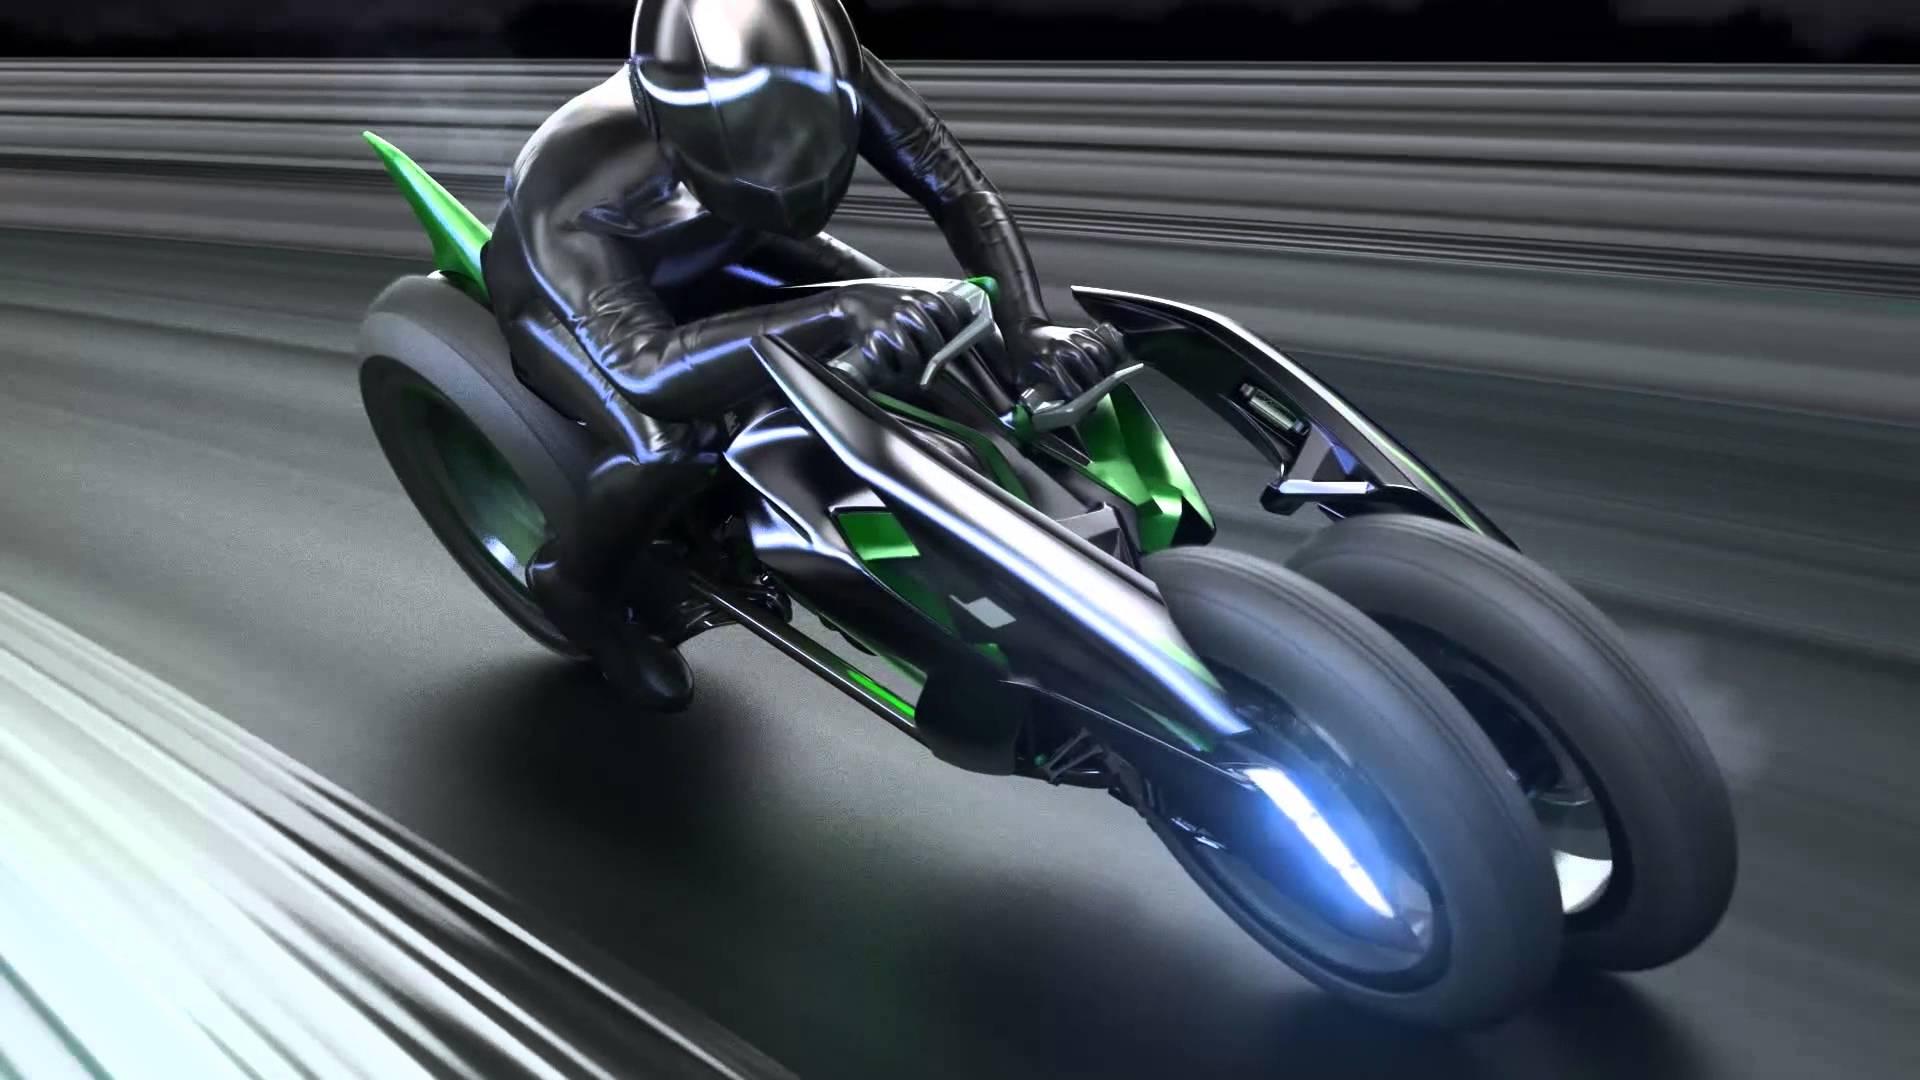 Kawasaki S Us Arm Unveils New Promo Video For Three Wheeler Concept